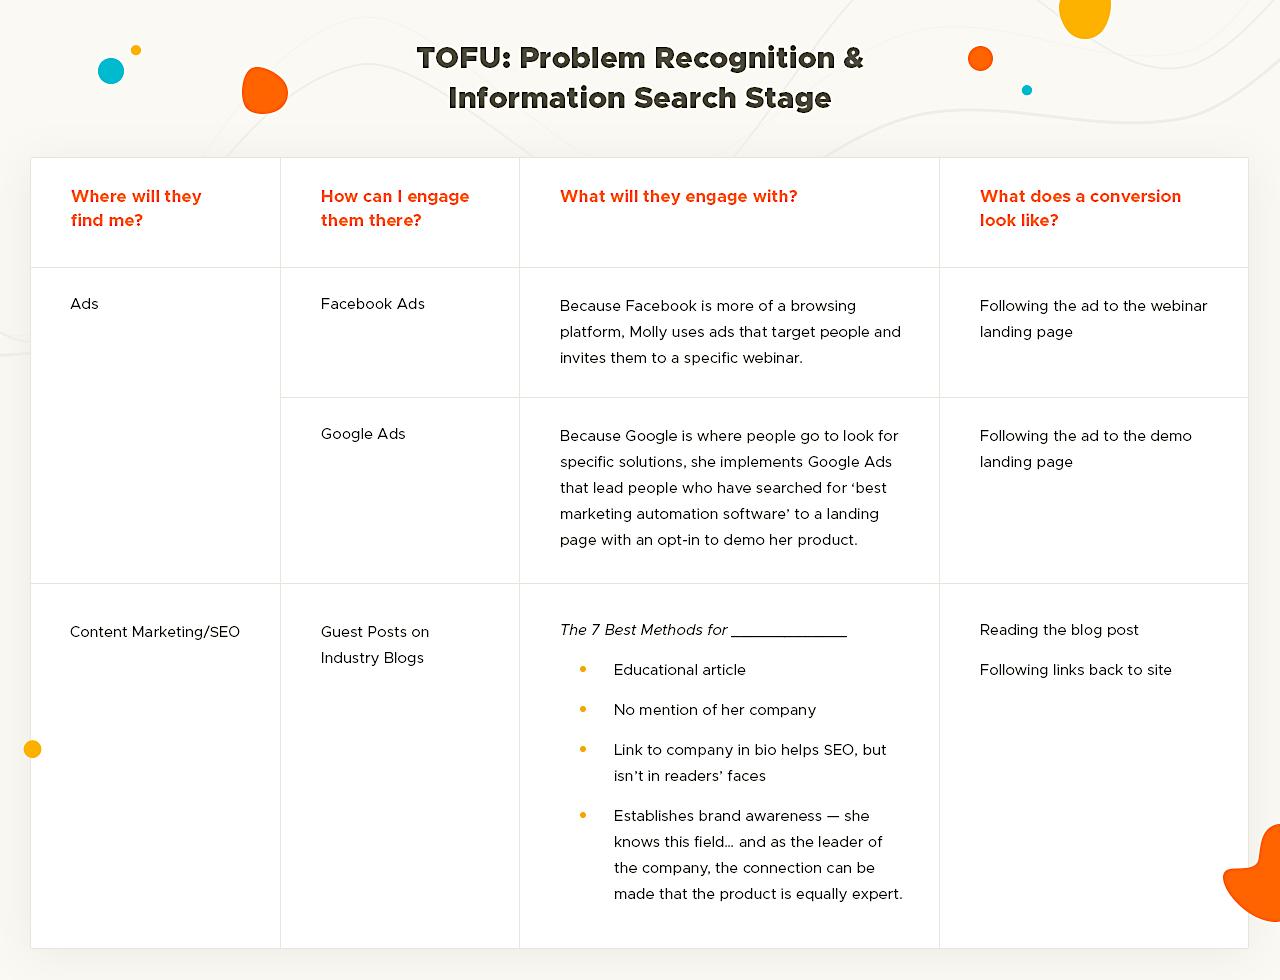 TOFU graphic